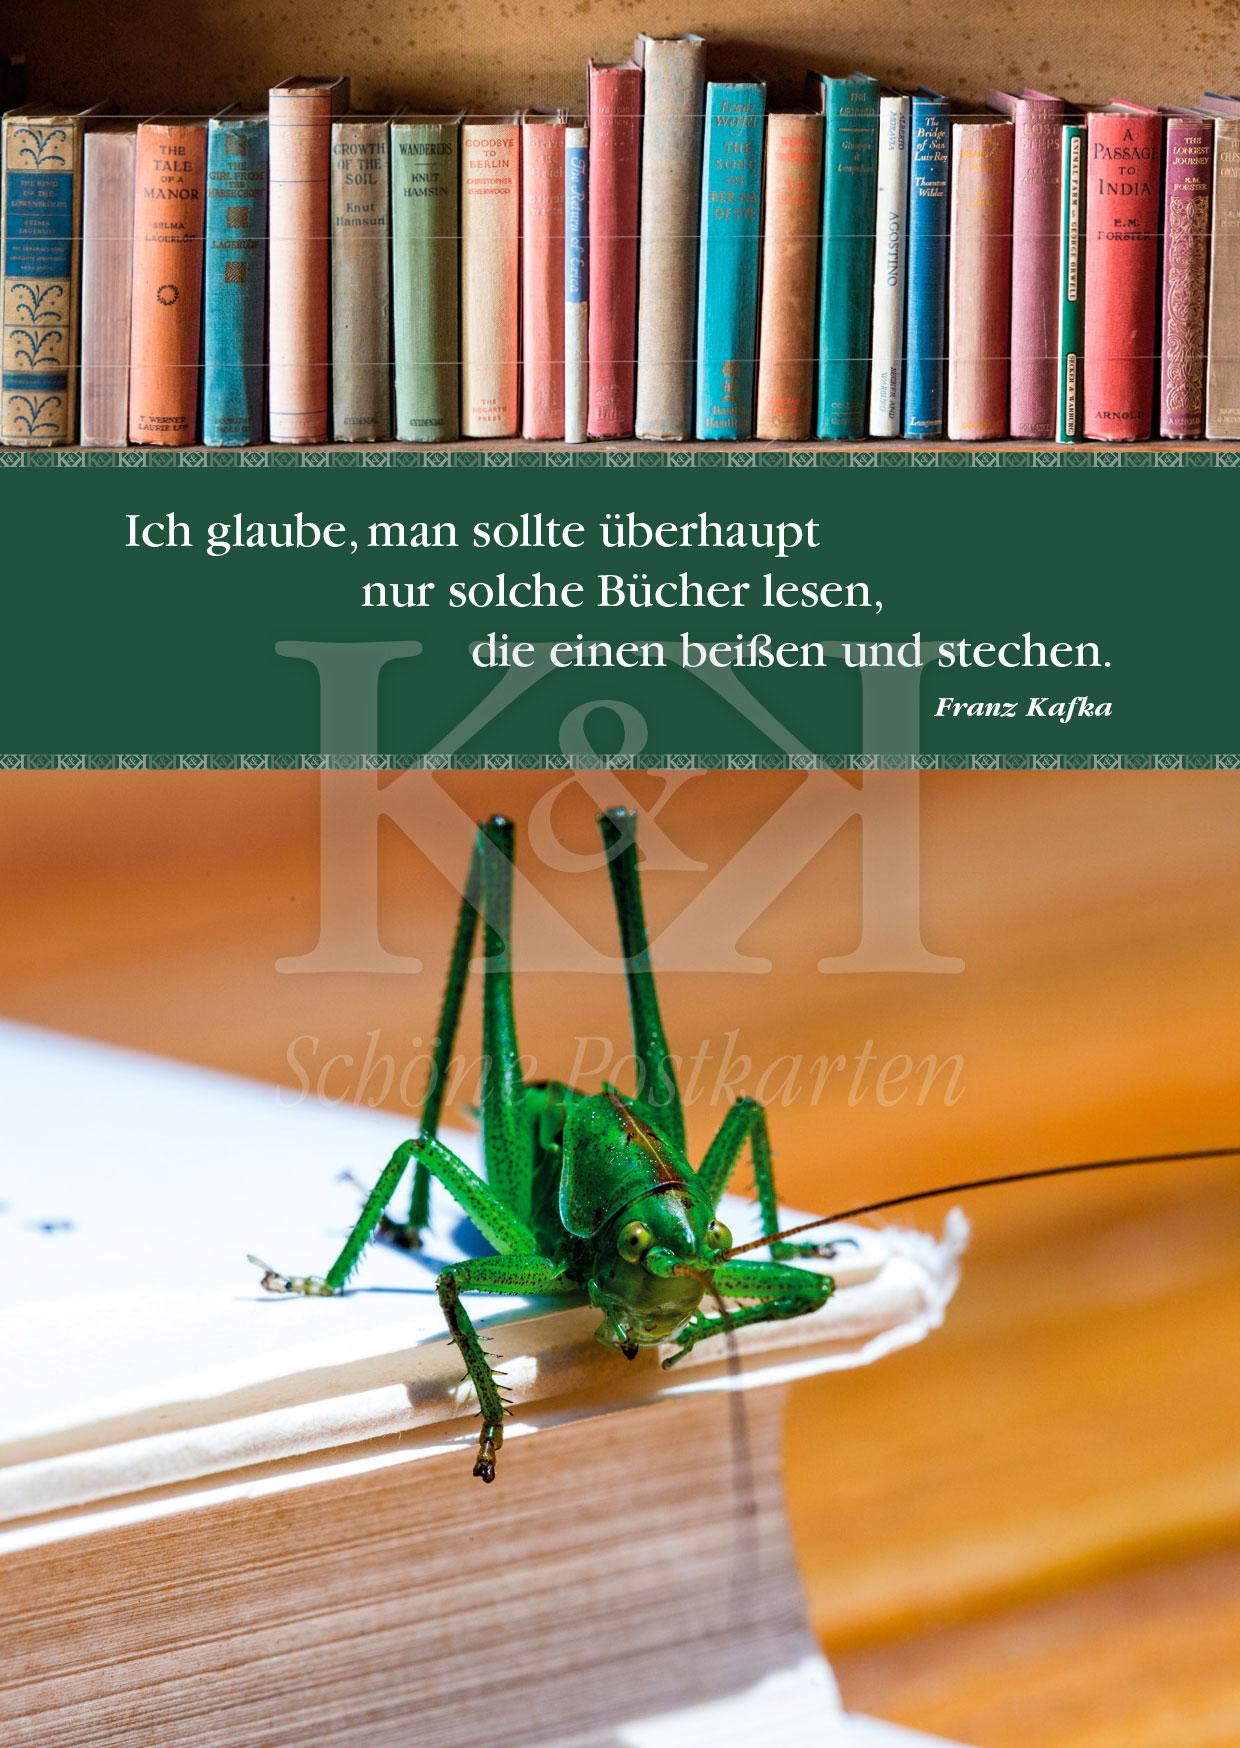 Schöne Postkarte Nr. 20: Kafka, Käfer, Bücher © 2018 www.schoenepostktarten.de